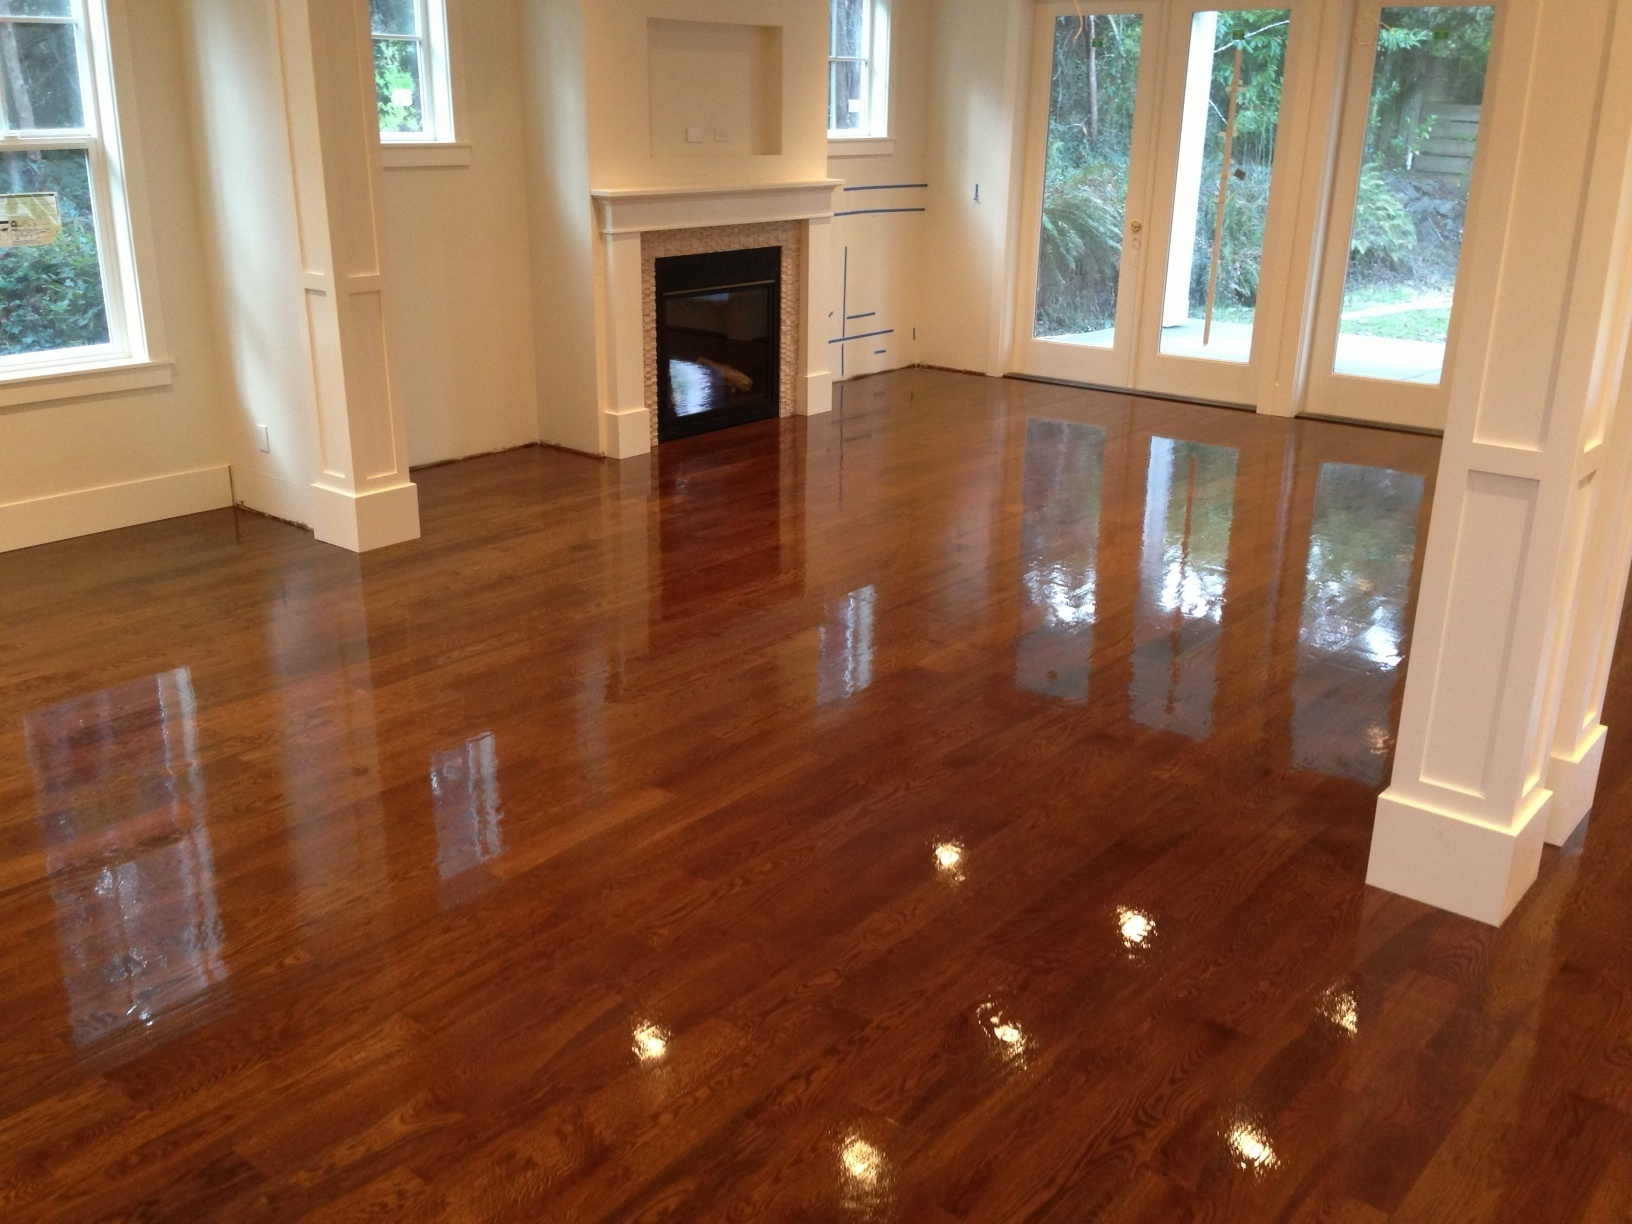 laminate wood flooring ideas paint colors with oak floors hardwoods design the best what color wood QVGJTTF